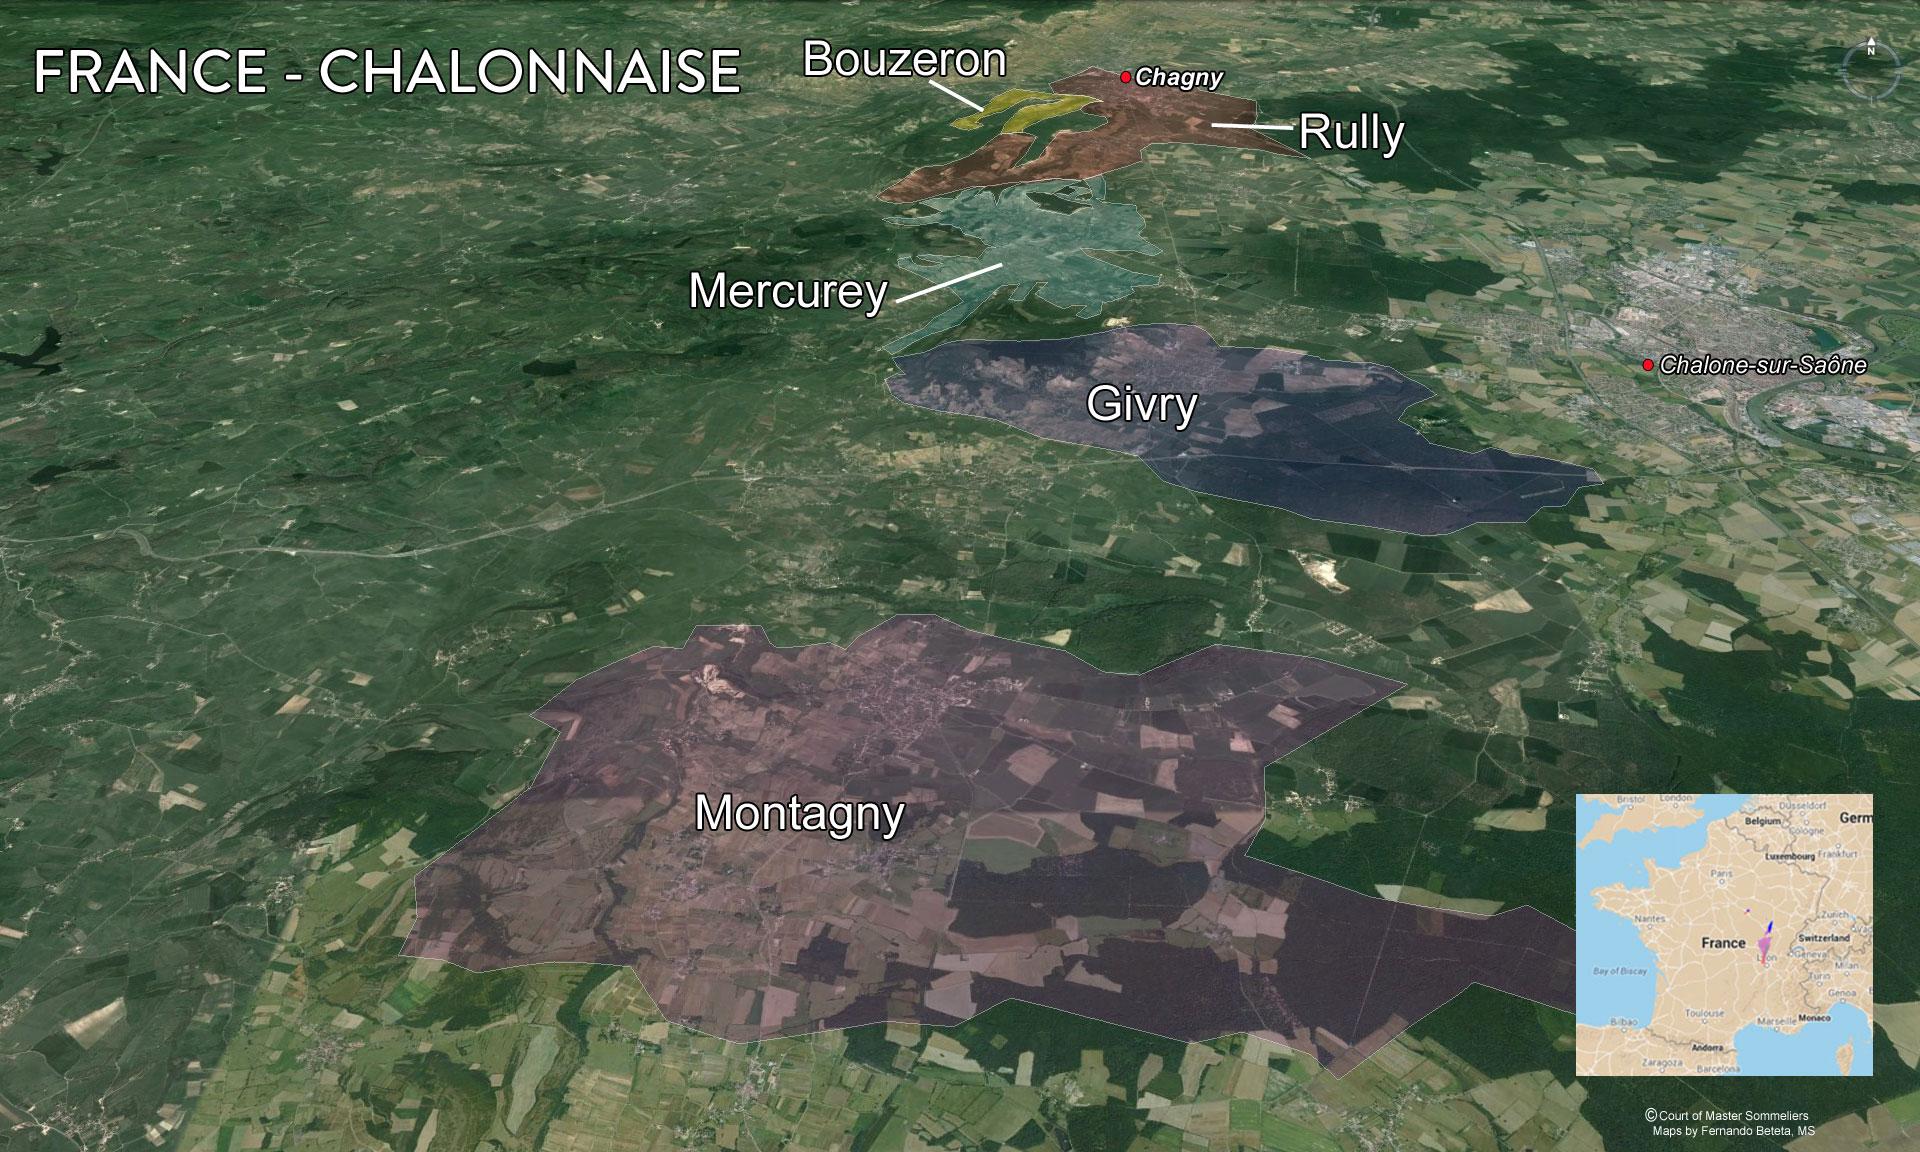 France-Burgundy-Chalonnaise.jpg